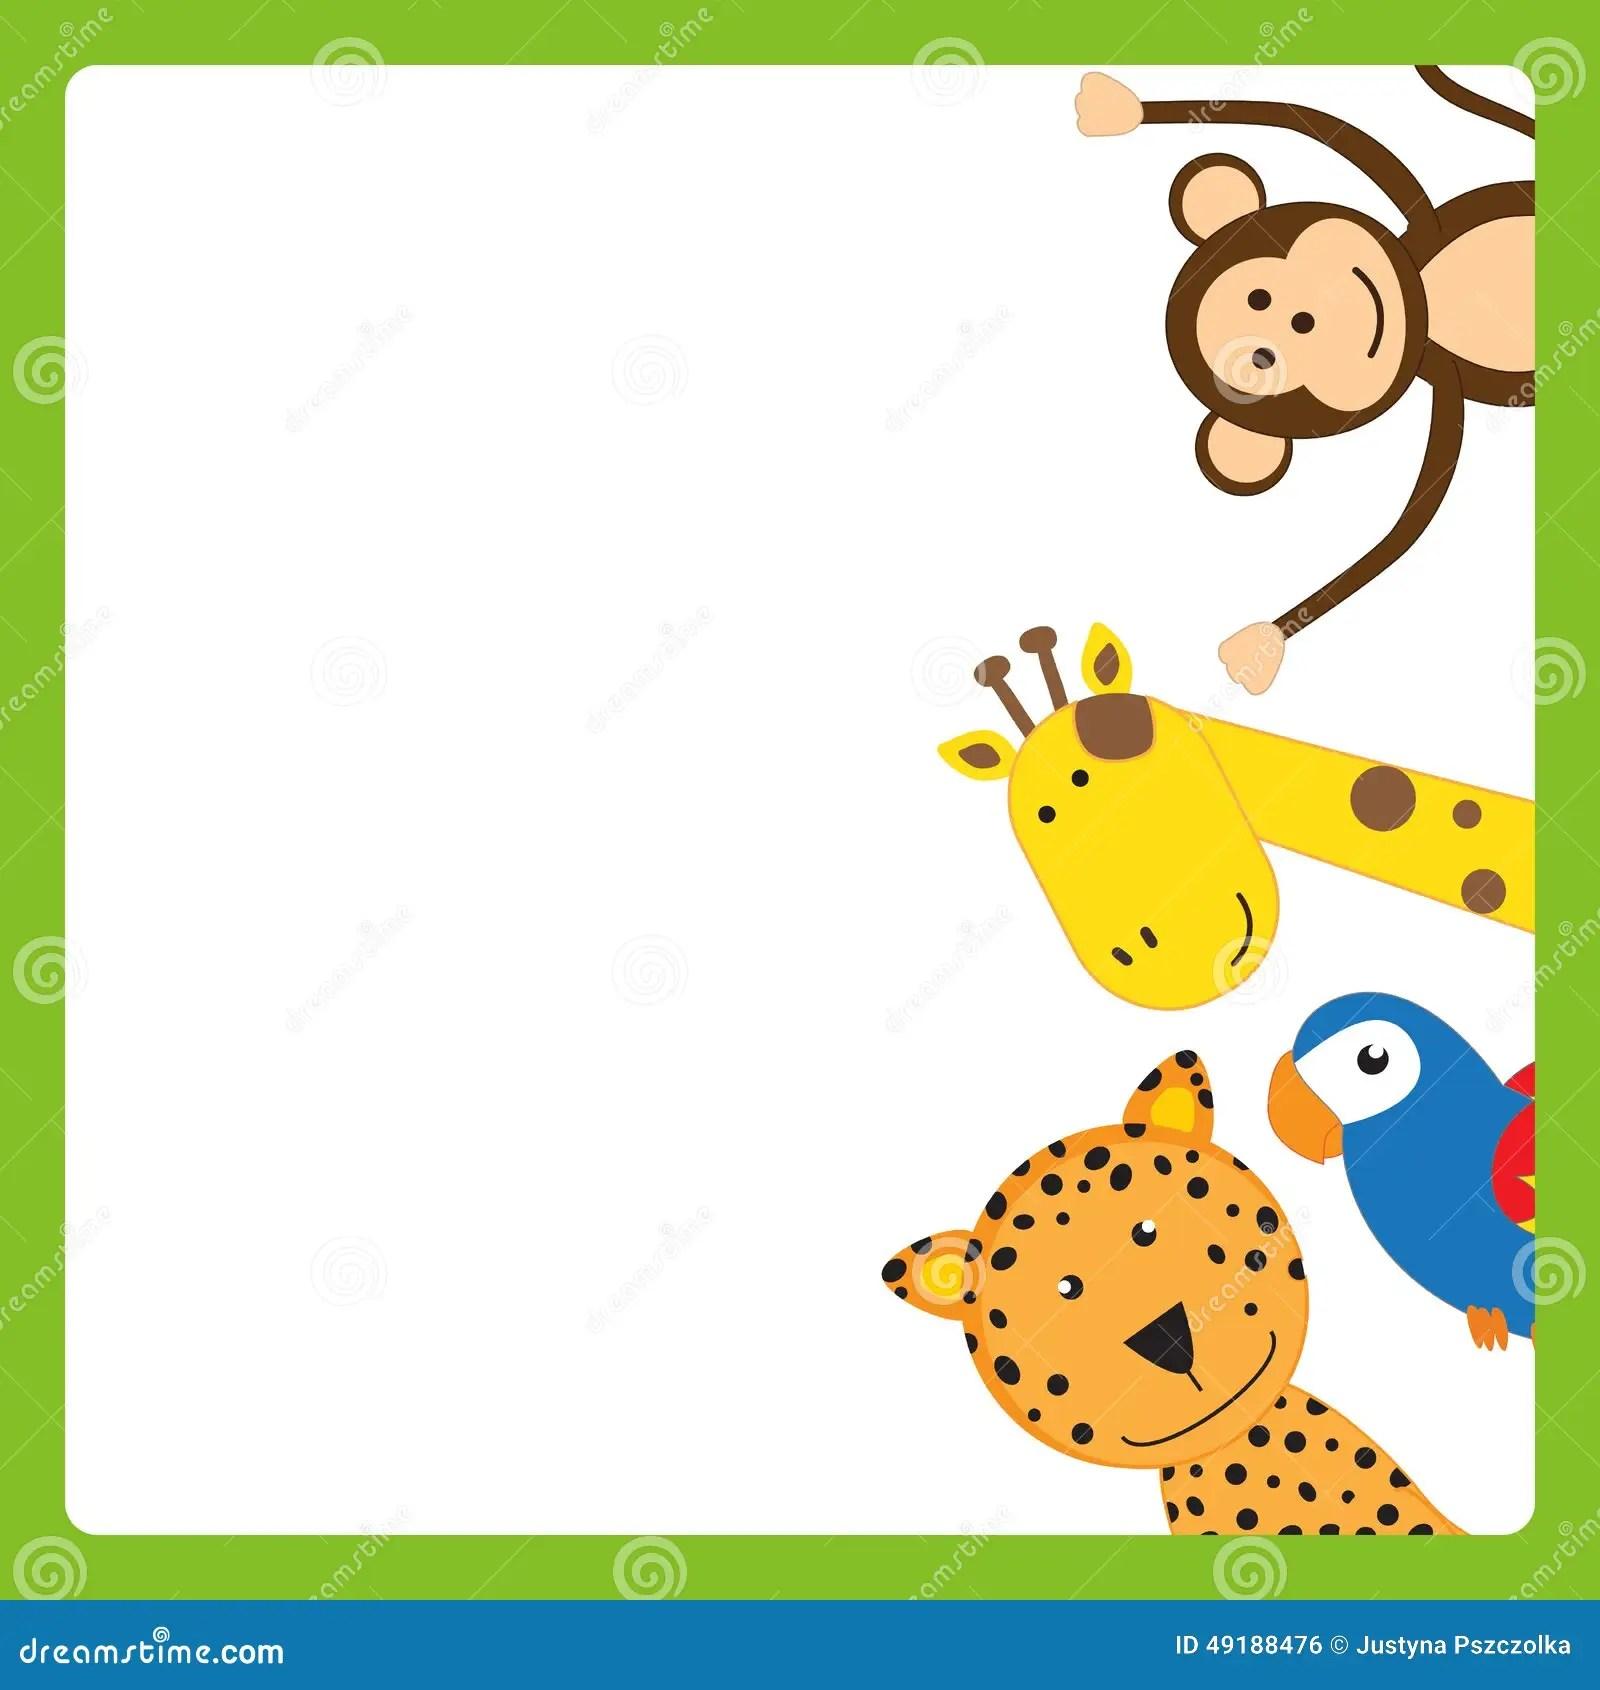 animal frame stock illustration